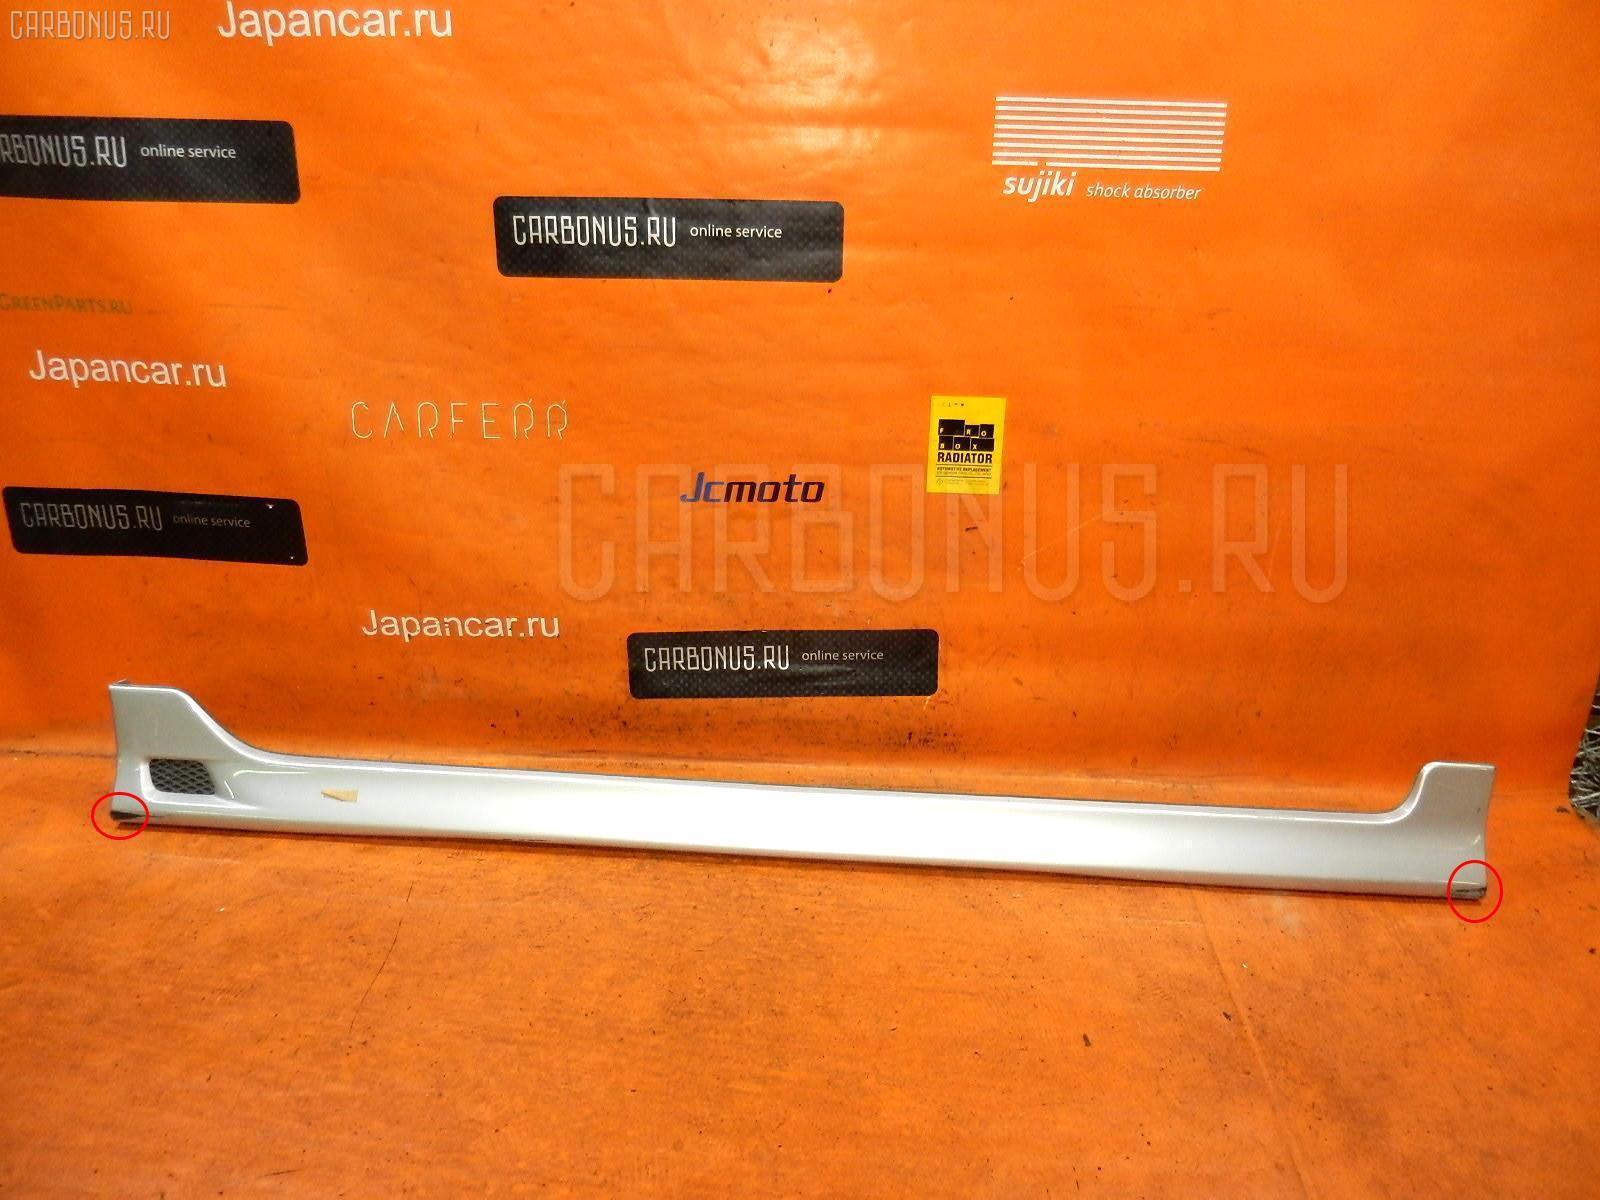 Порог кузова пластиковый ( обвес ) TOYOTA COROLLA RUNX NZE121 Фото 6